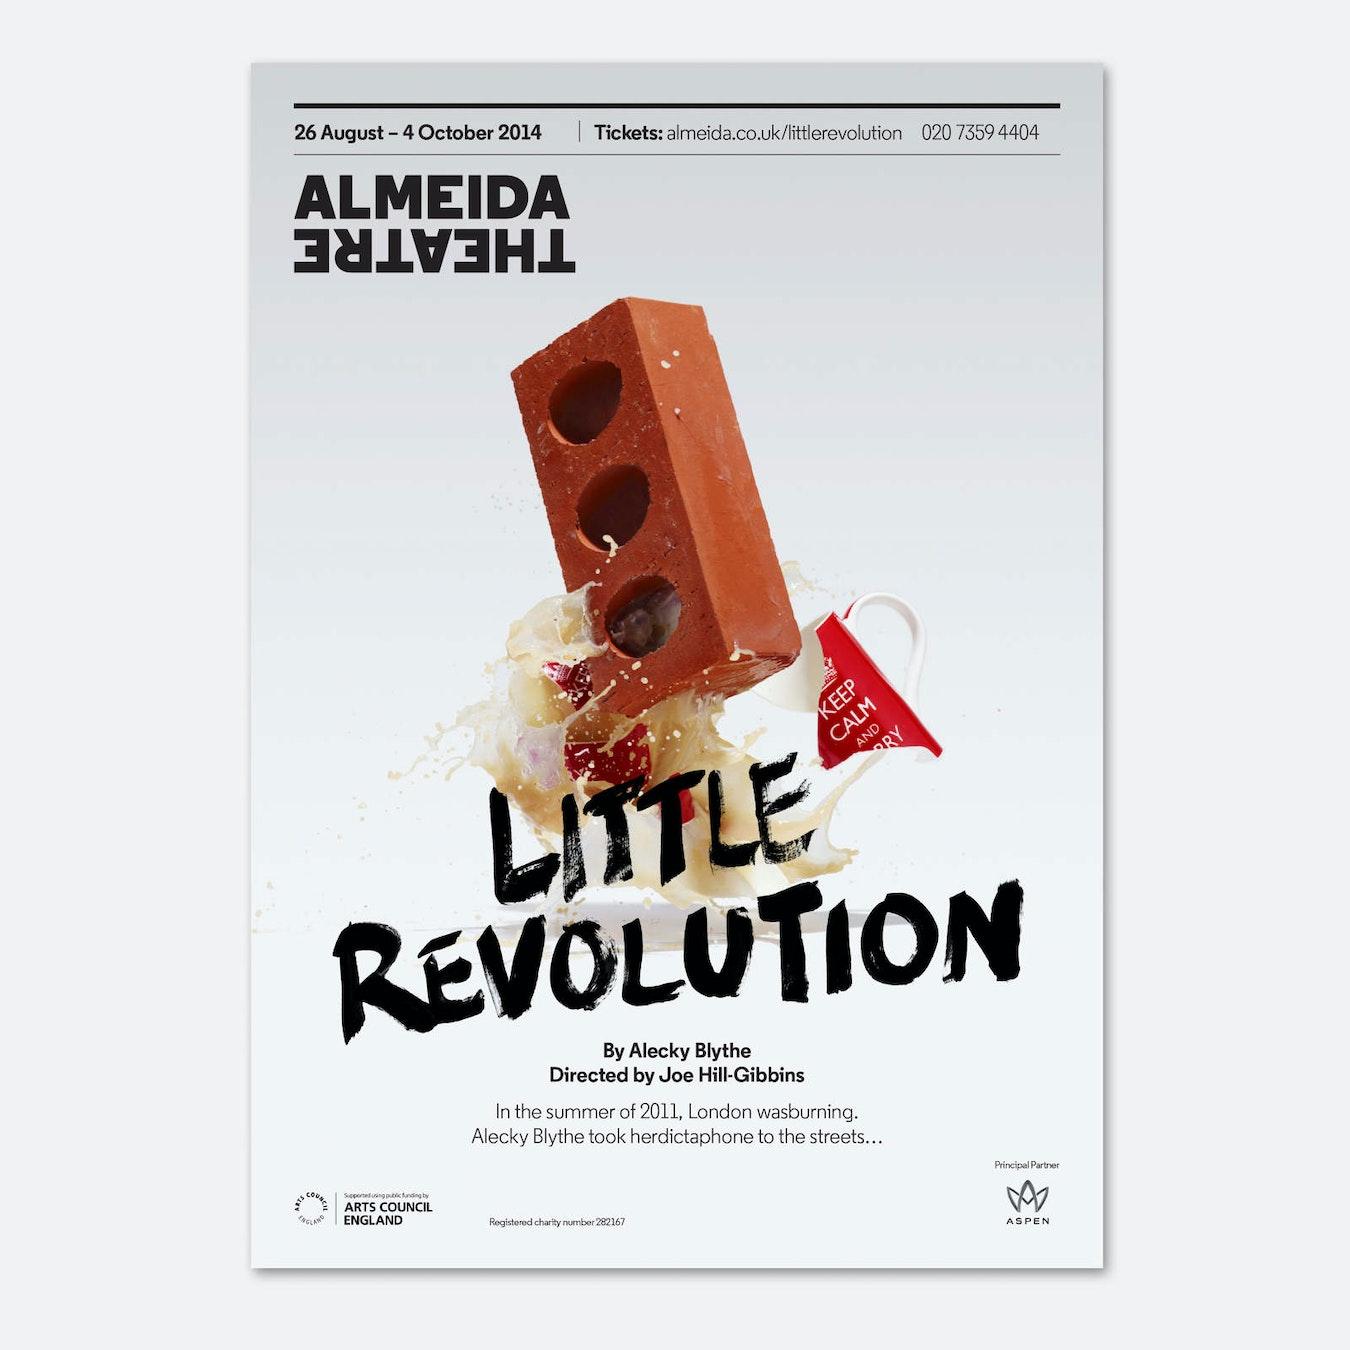 Almeida_Posters_4_1600_c